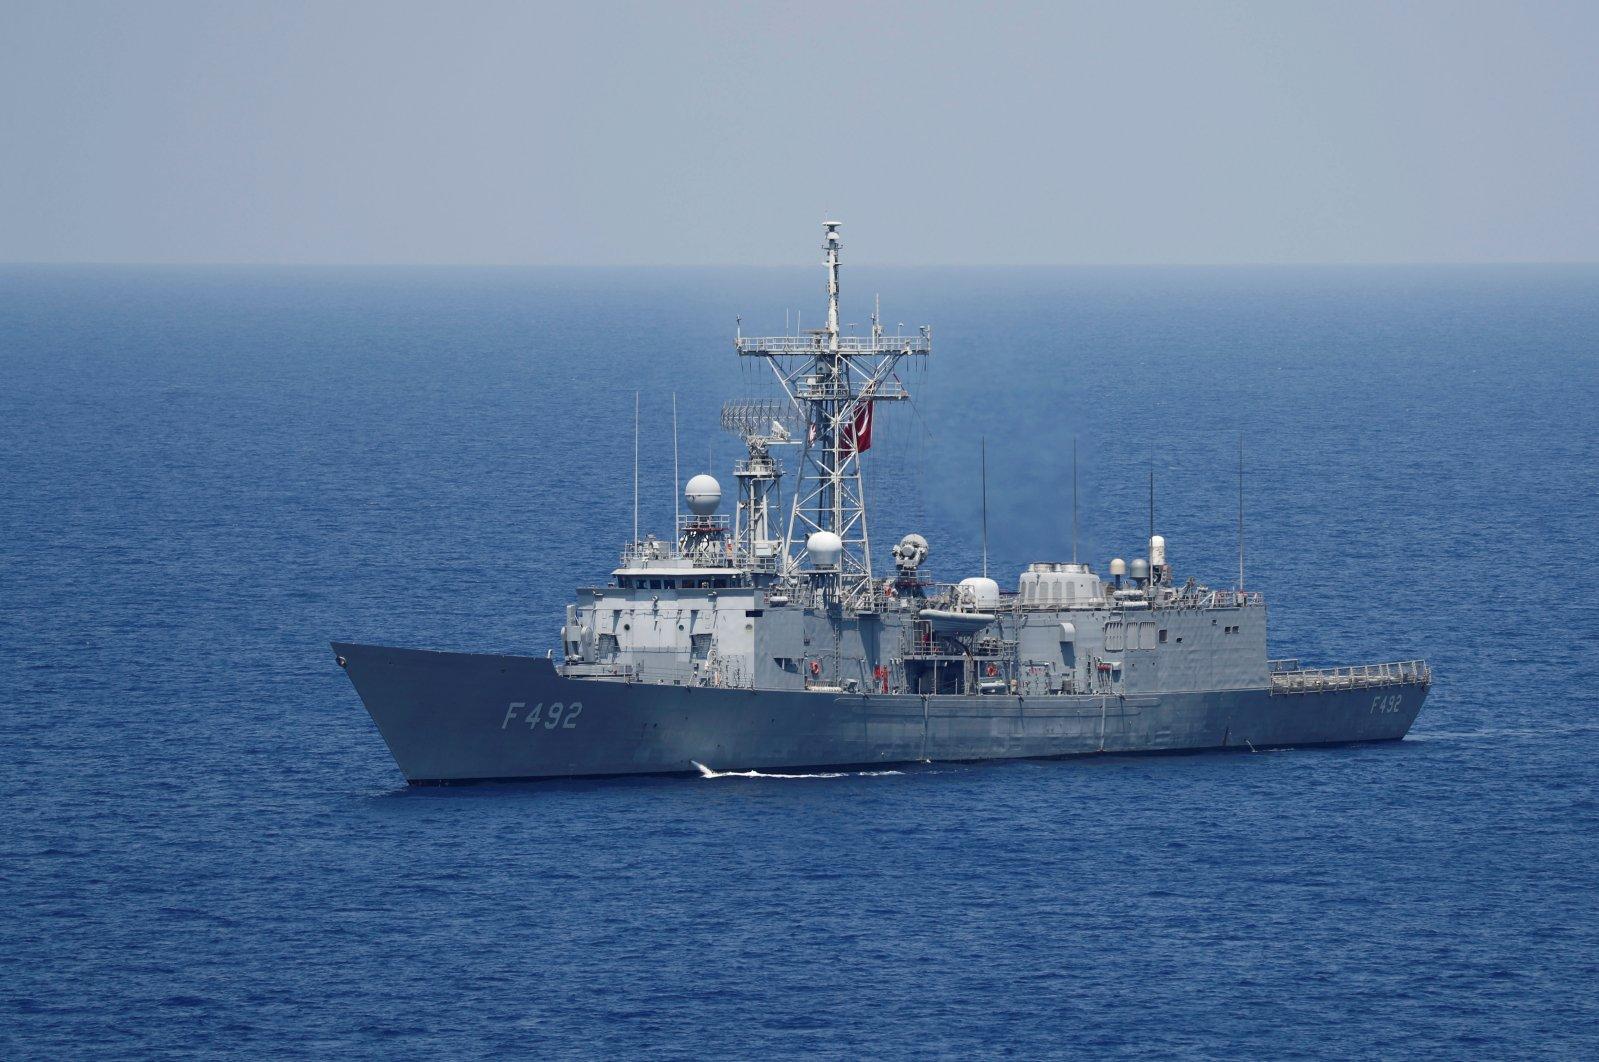 Turkish navy frigate TCG Gemlik (F-492) escorts Turkish drilling vessel Yavuz in the Eastern Mediterranean Sea off Cyprus, Aug. 6, 2019. (Reuters Photo)